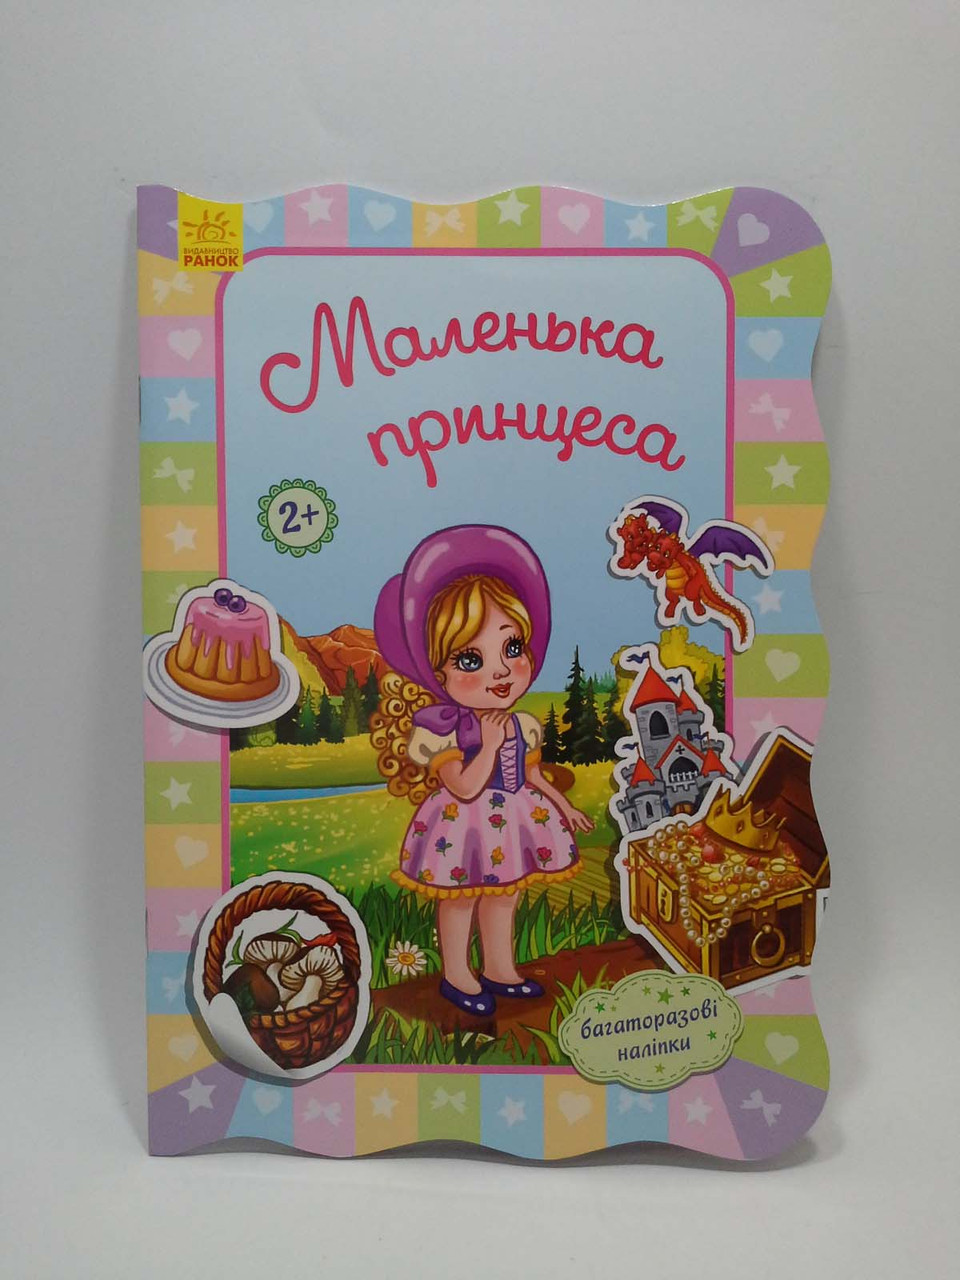 Ранок Для маленьких дівчаток Маленька принцеса